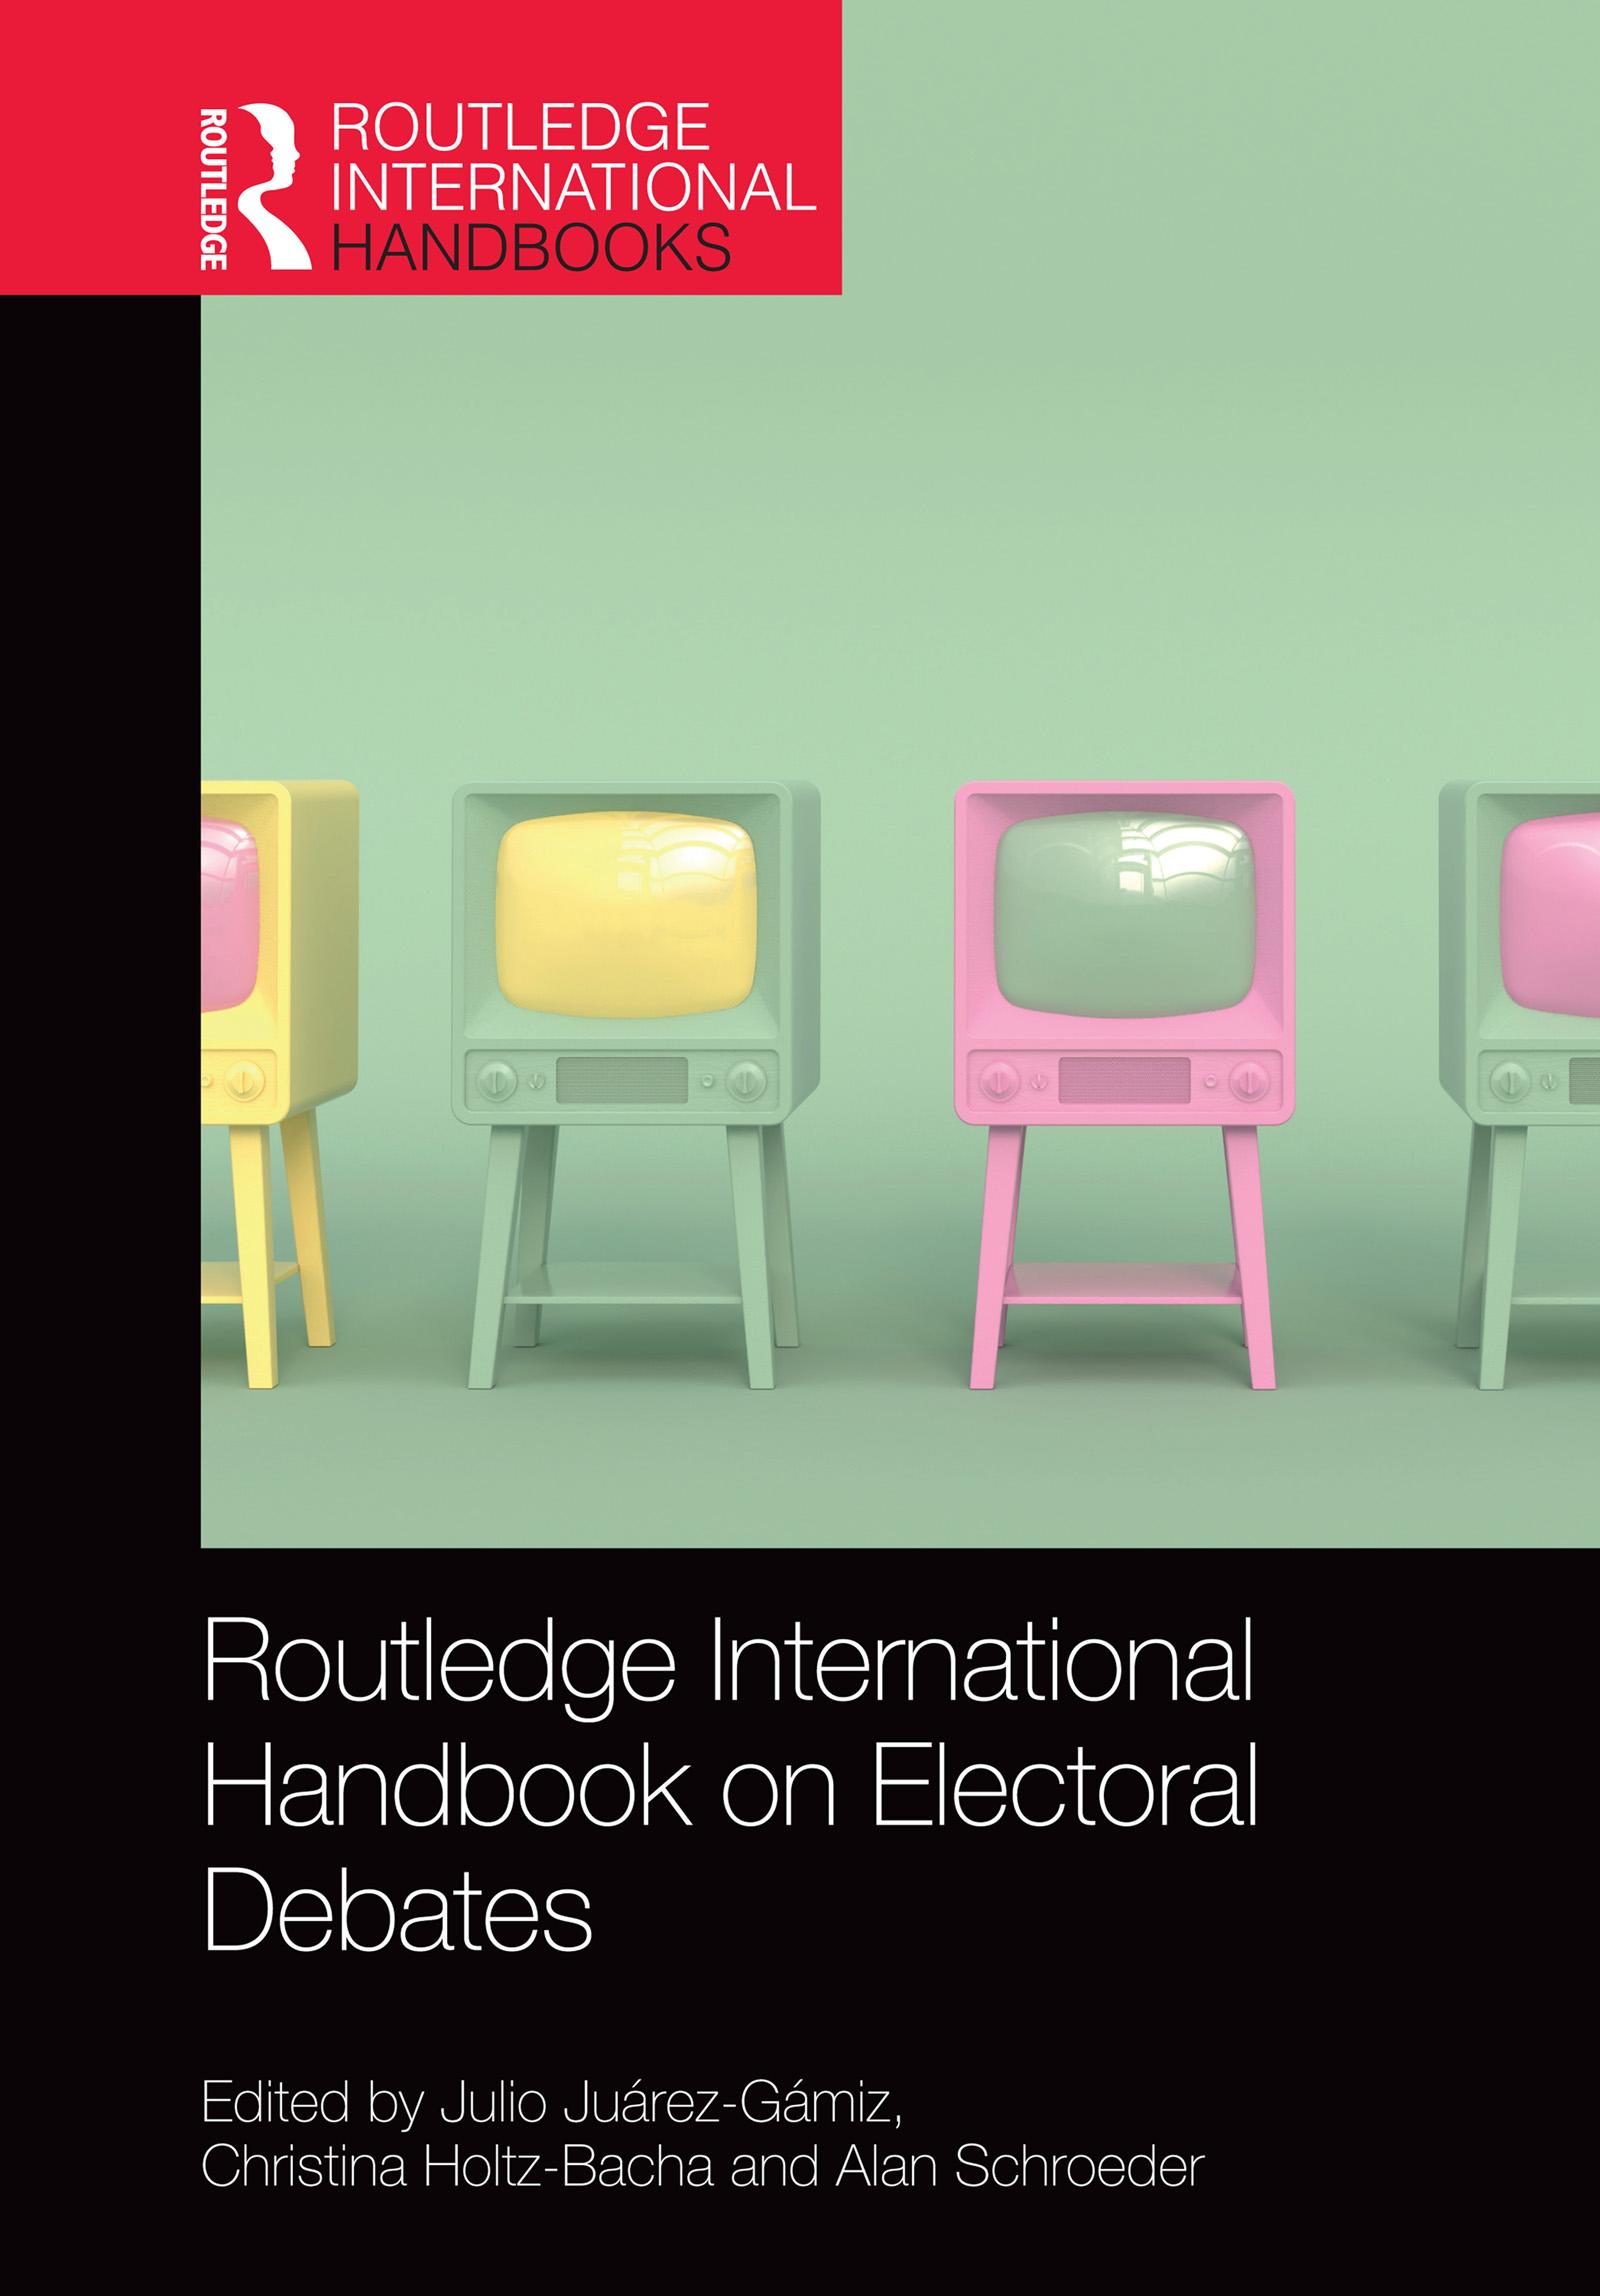 Routledge International Handbook on Electoral Debates